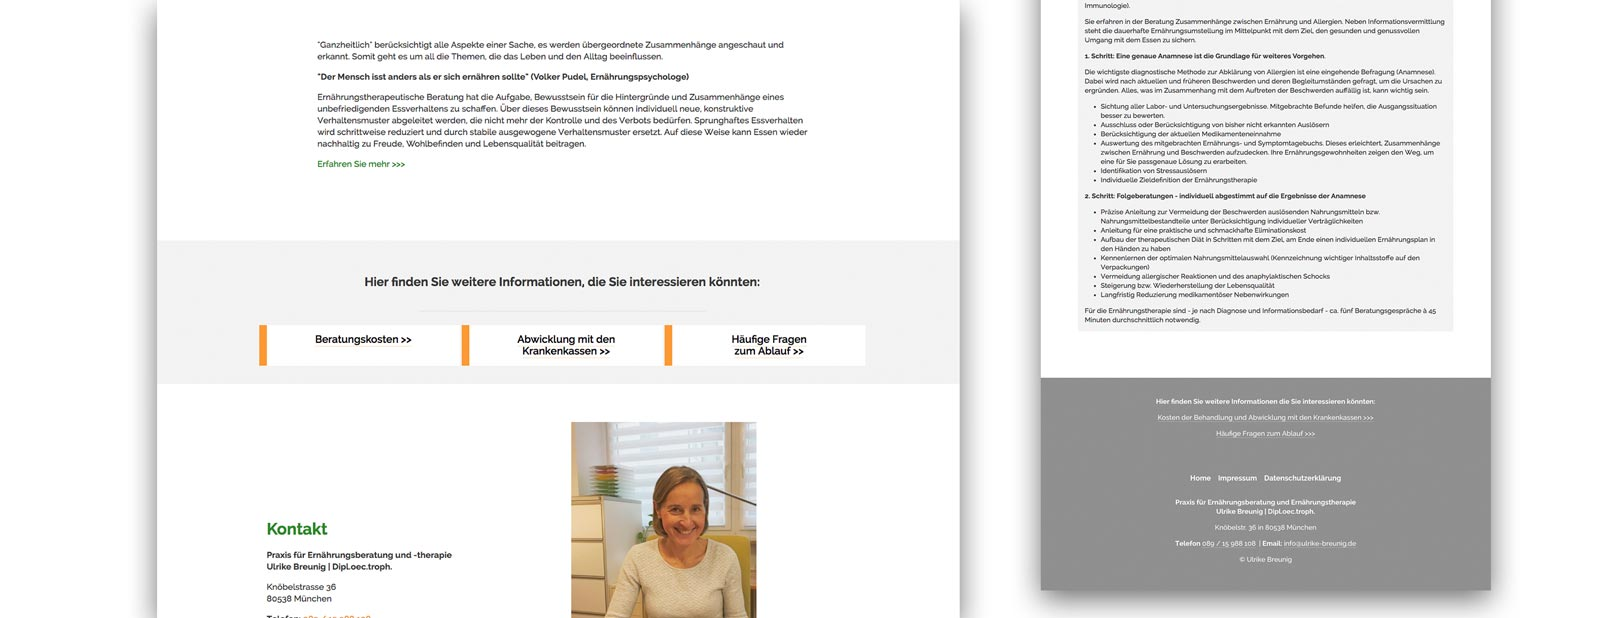 Breunig_Responsive_Webdesign_6.jpg